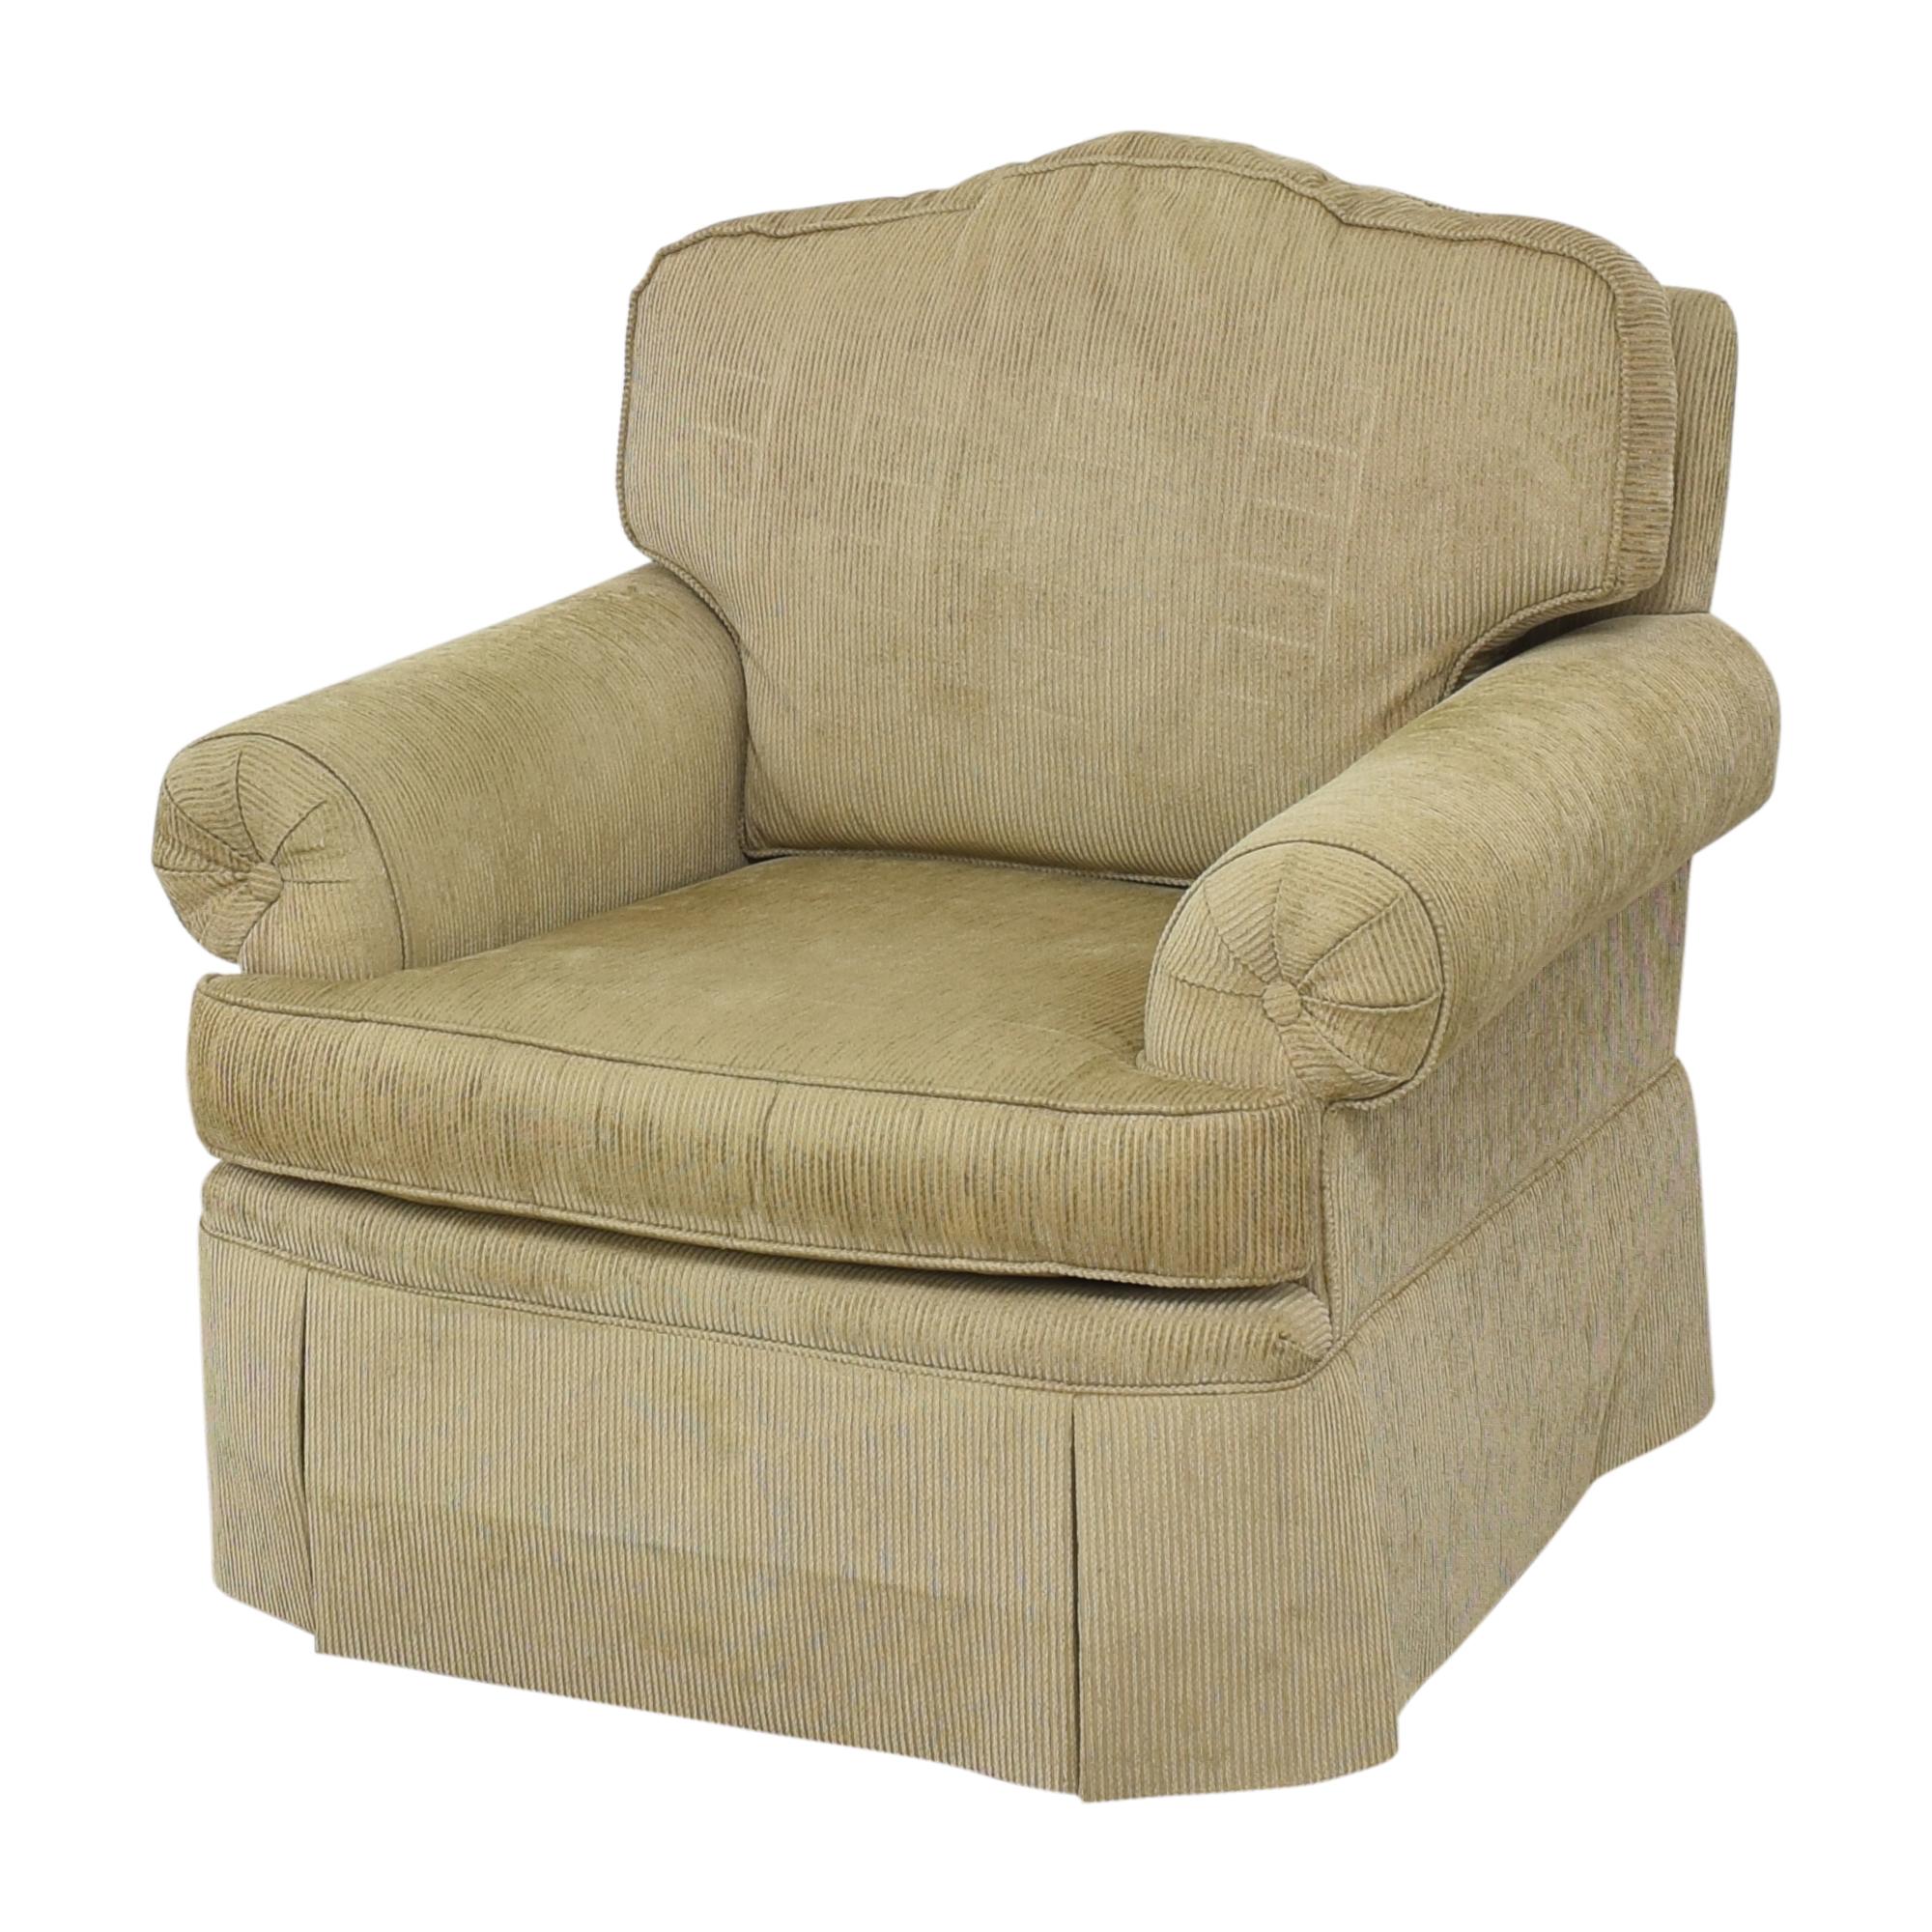 Drexel Heritage Drexel Heritage Skirted Club Chair pa